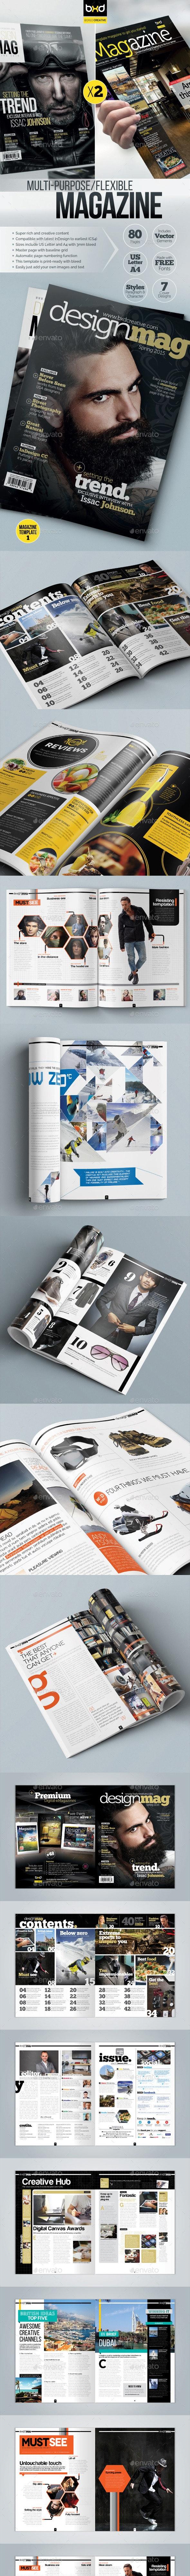 Magazine Template Bundle - InDesign Layout V3 - Magazines Print Templates